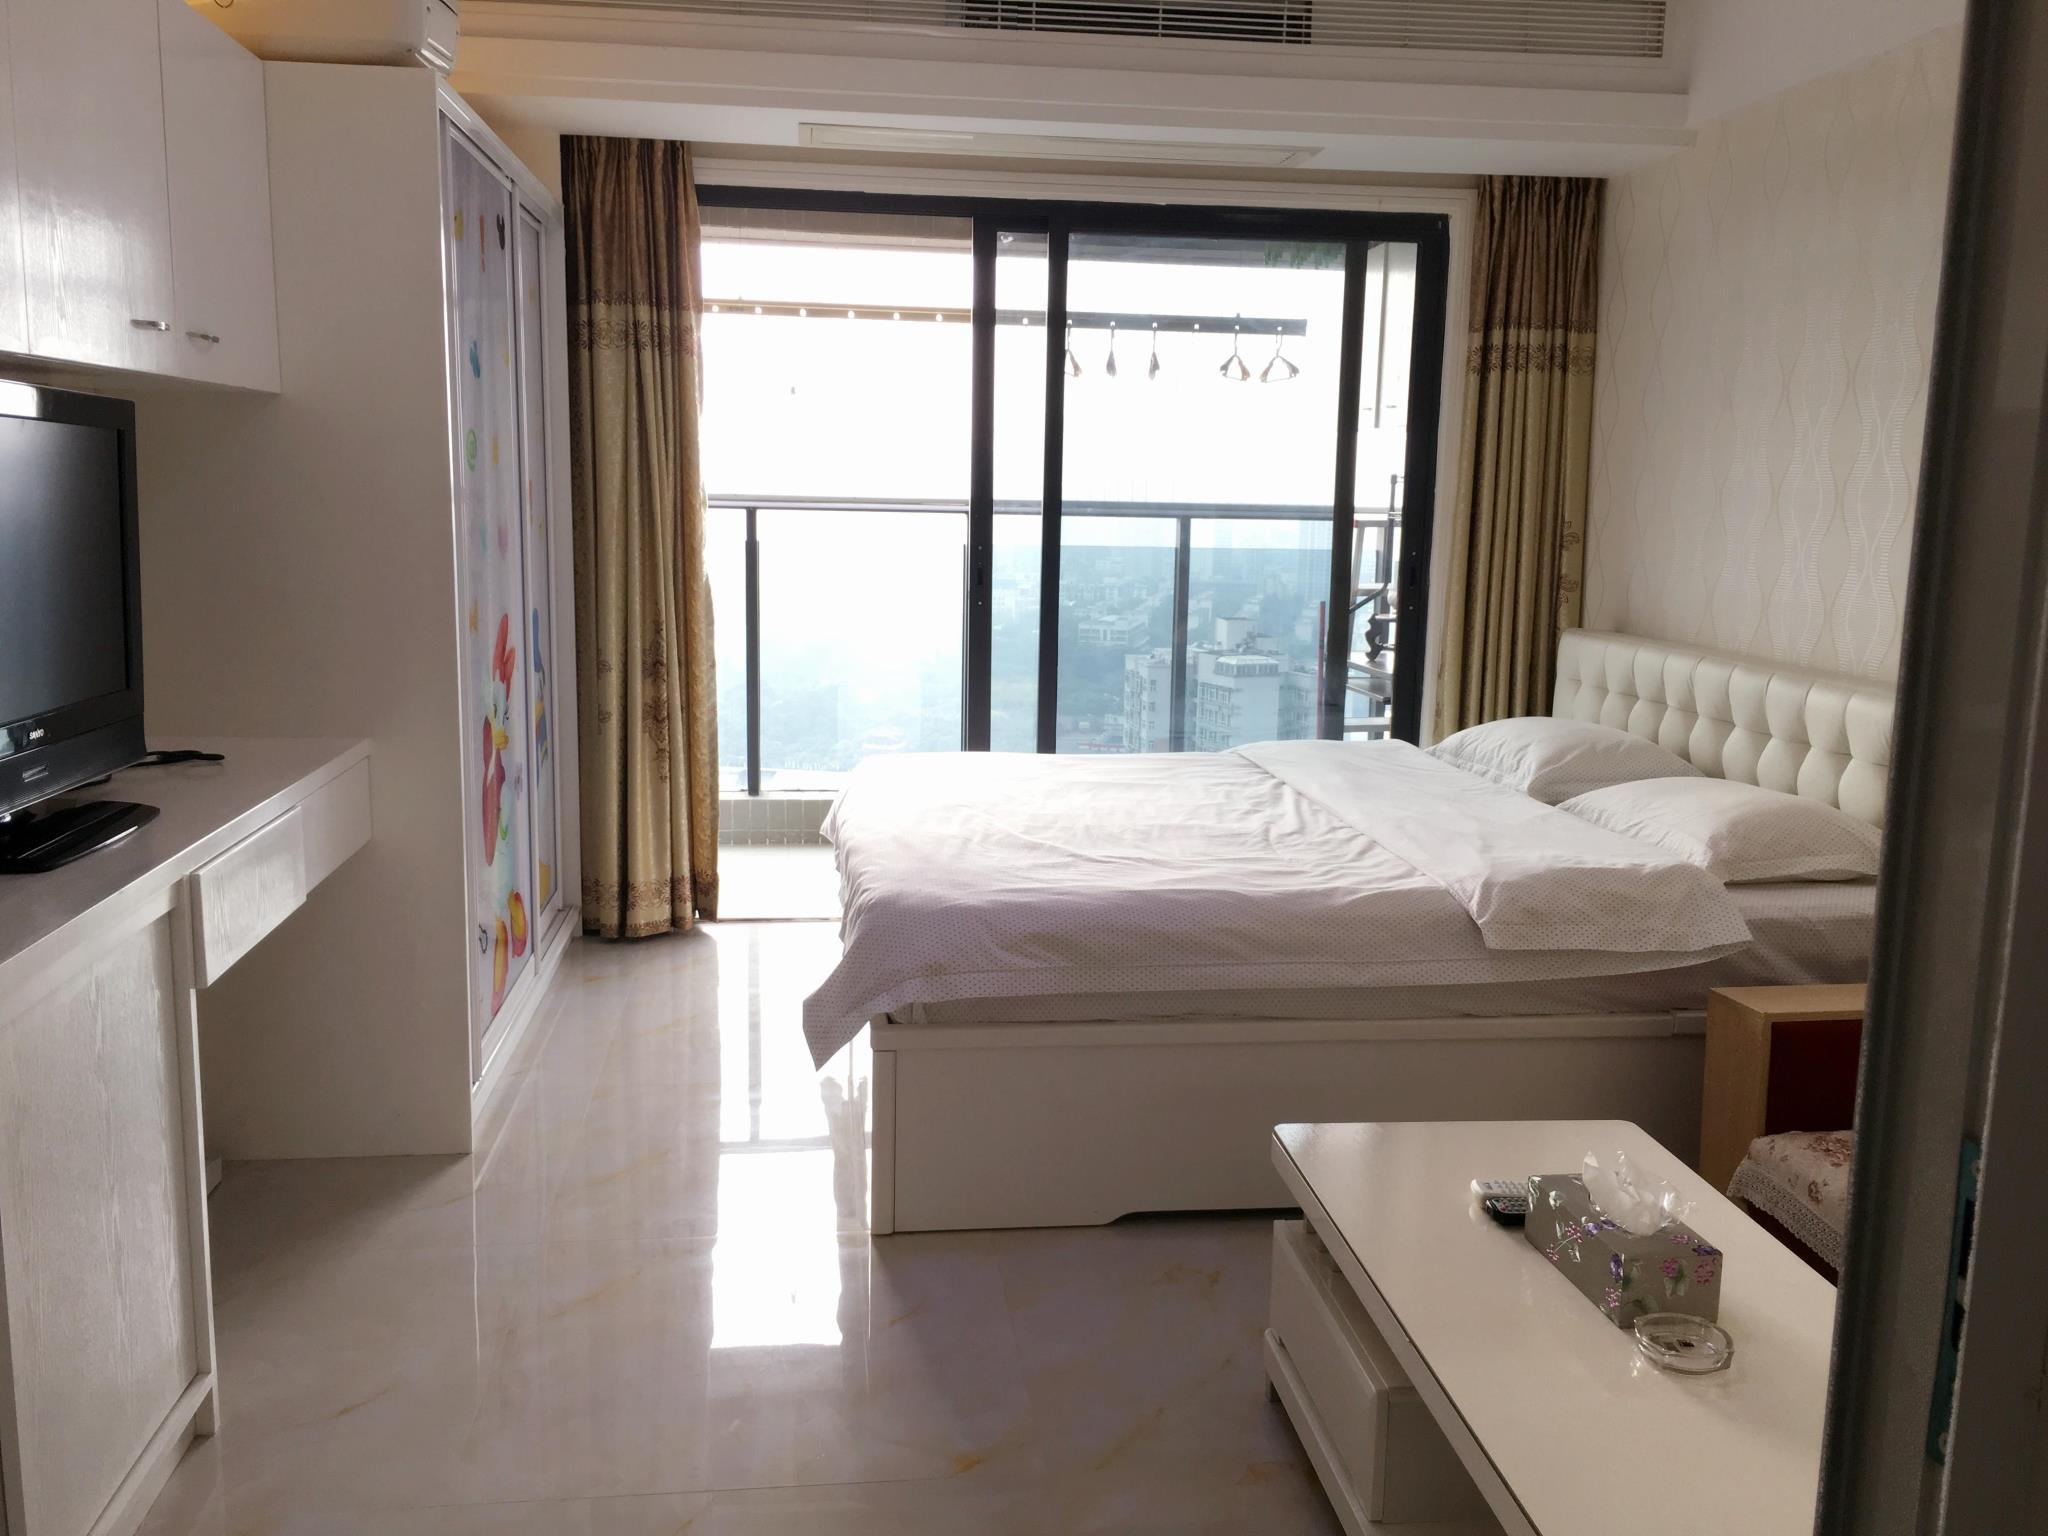 MILAN HOLIDAY 1 Bedroom Apartment